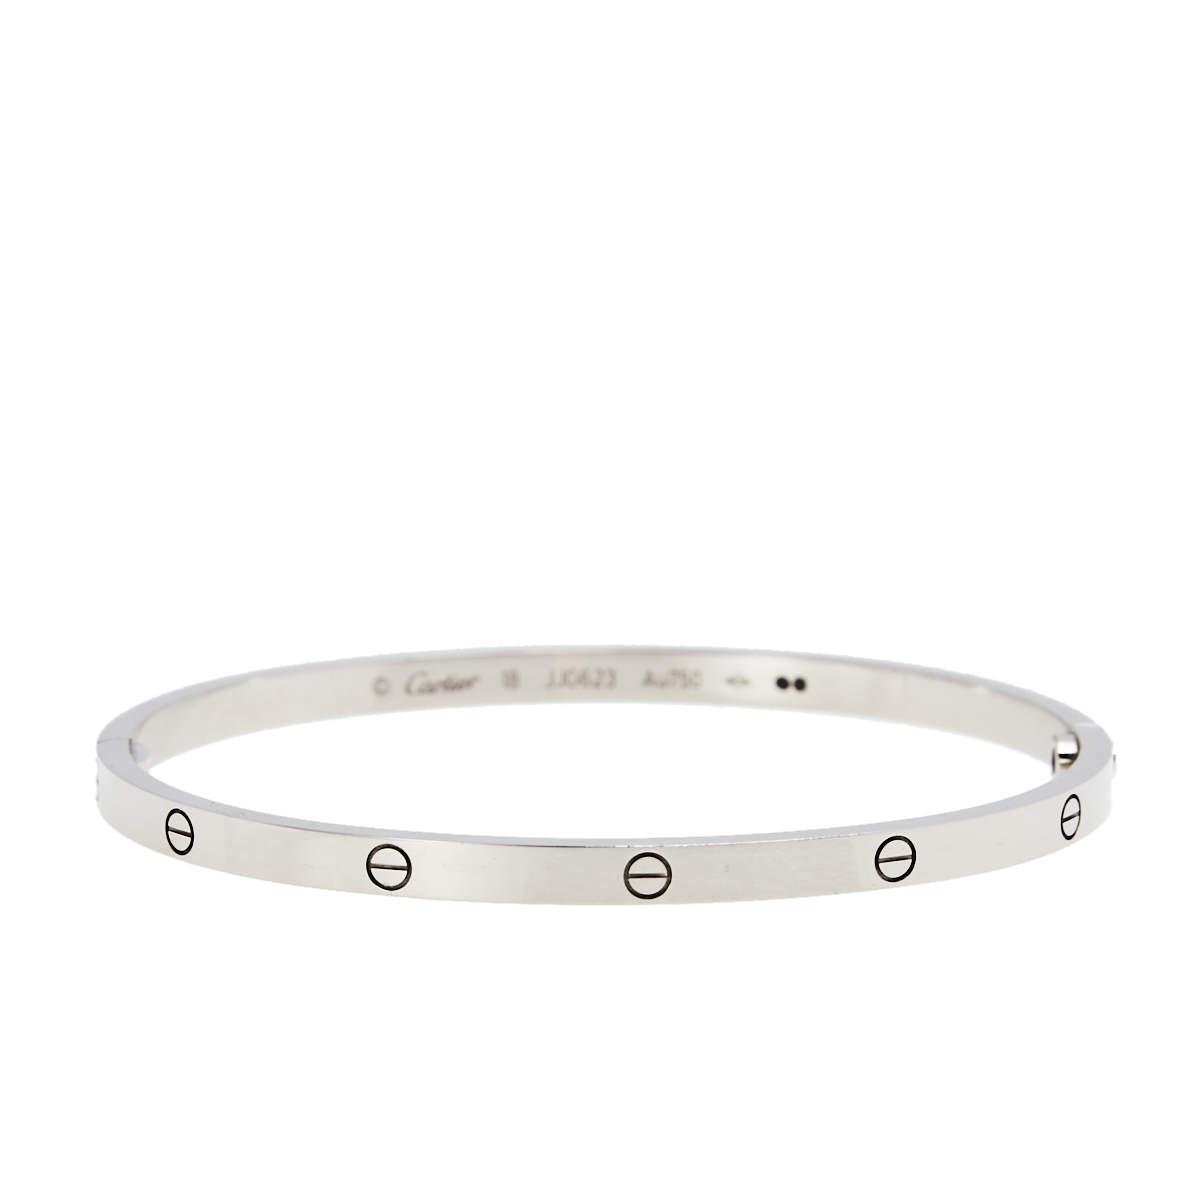 Cartier Love 18K White Gold SM Narrow Bracelet 18